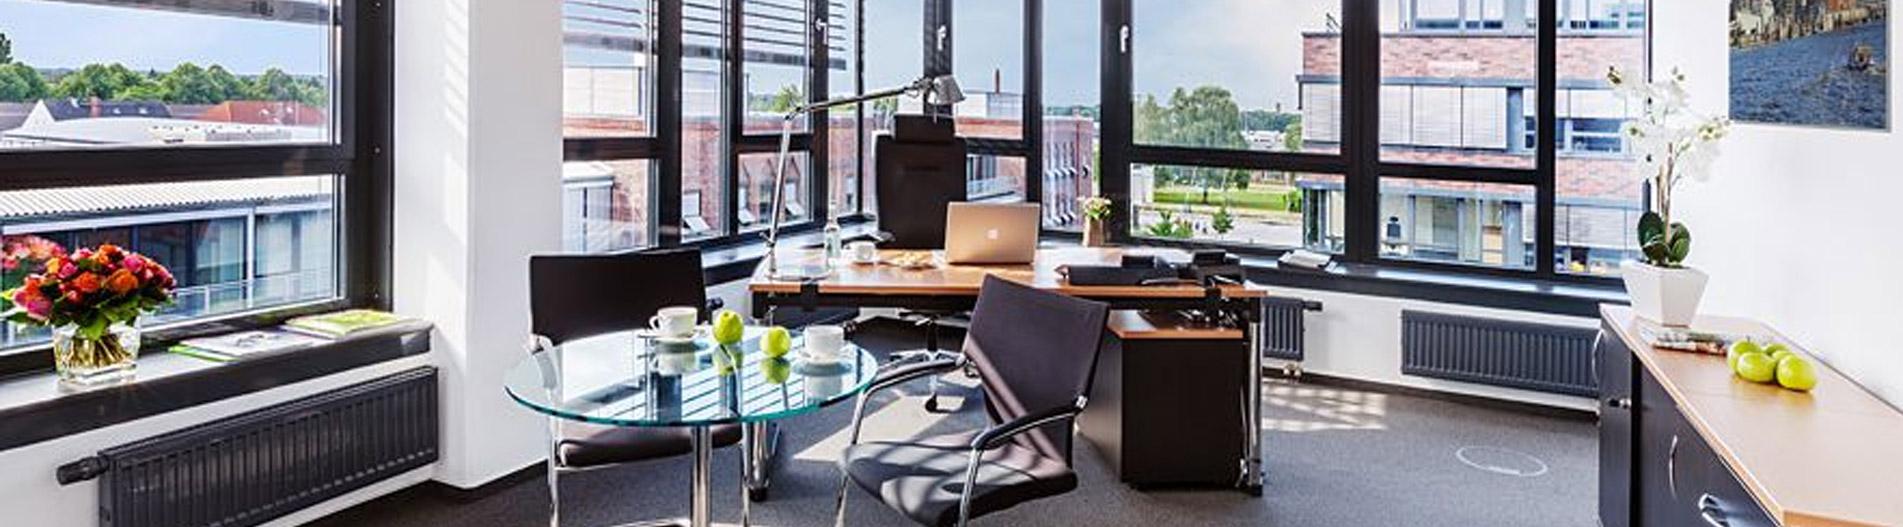 Büros in Hamburg Eppendorf